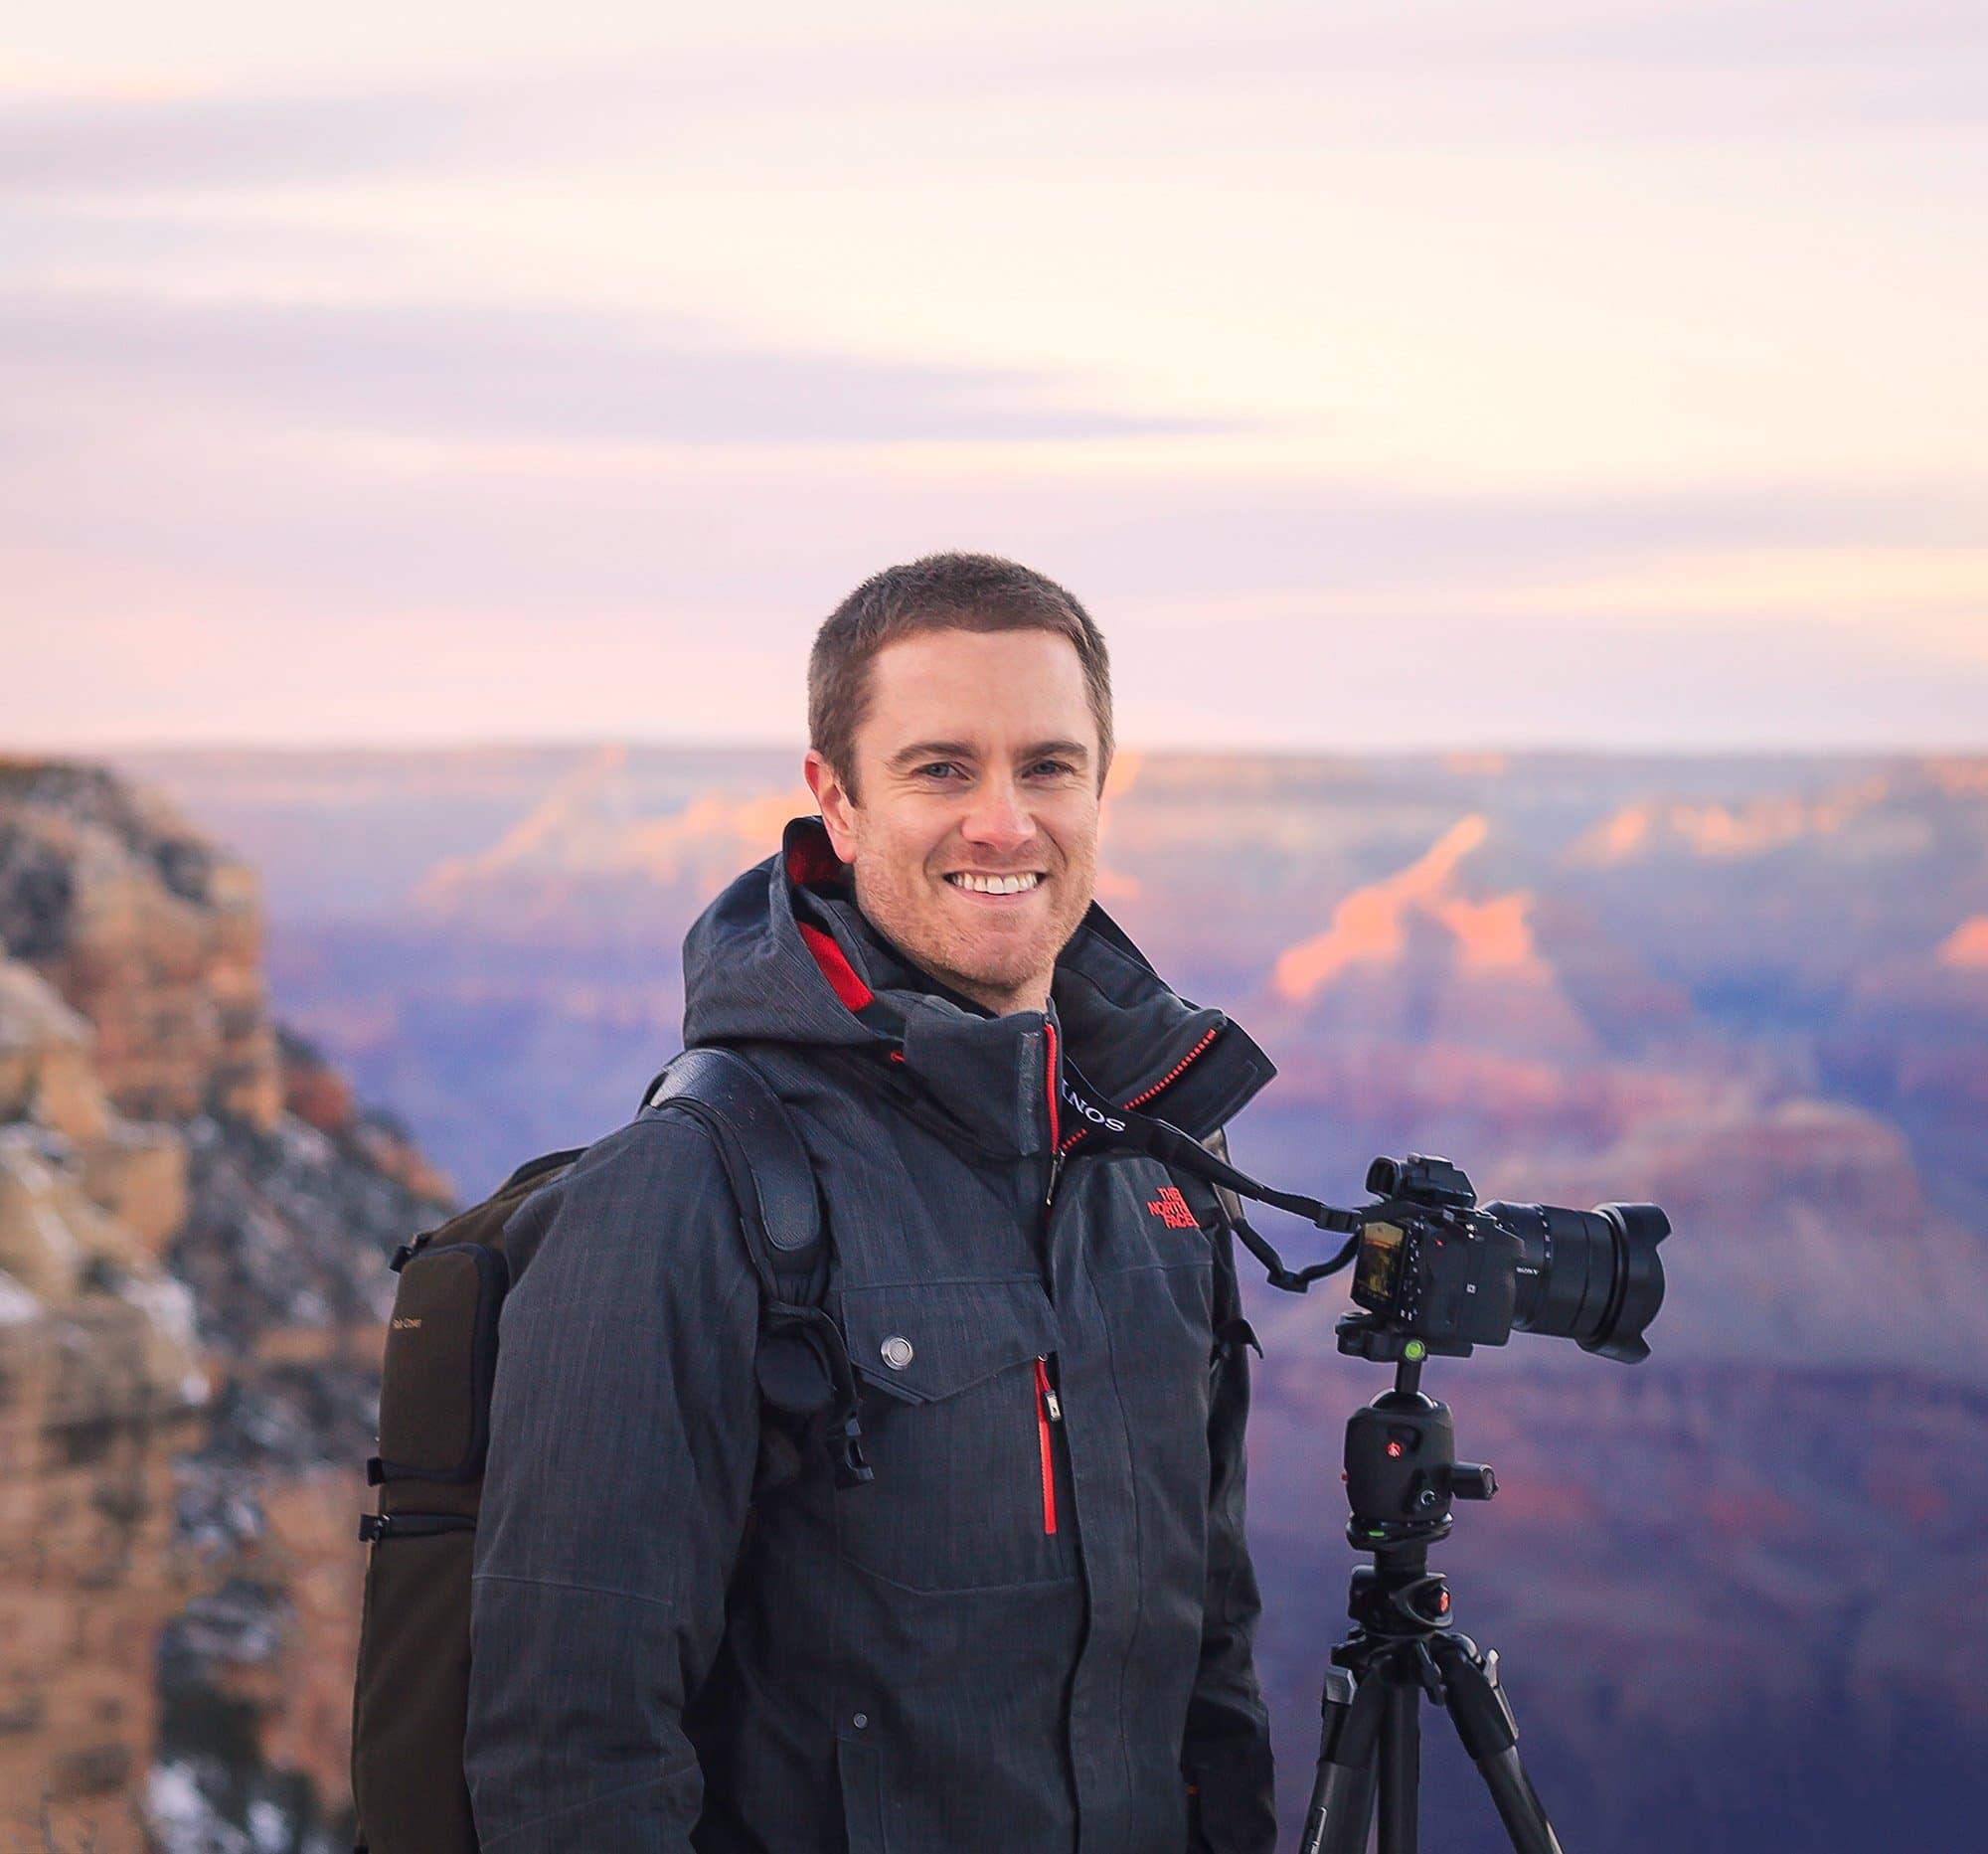 Presetpro-Tim-Martin-Photographer